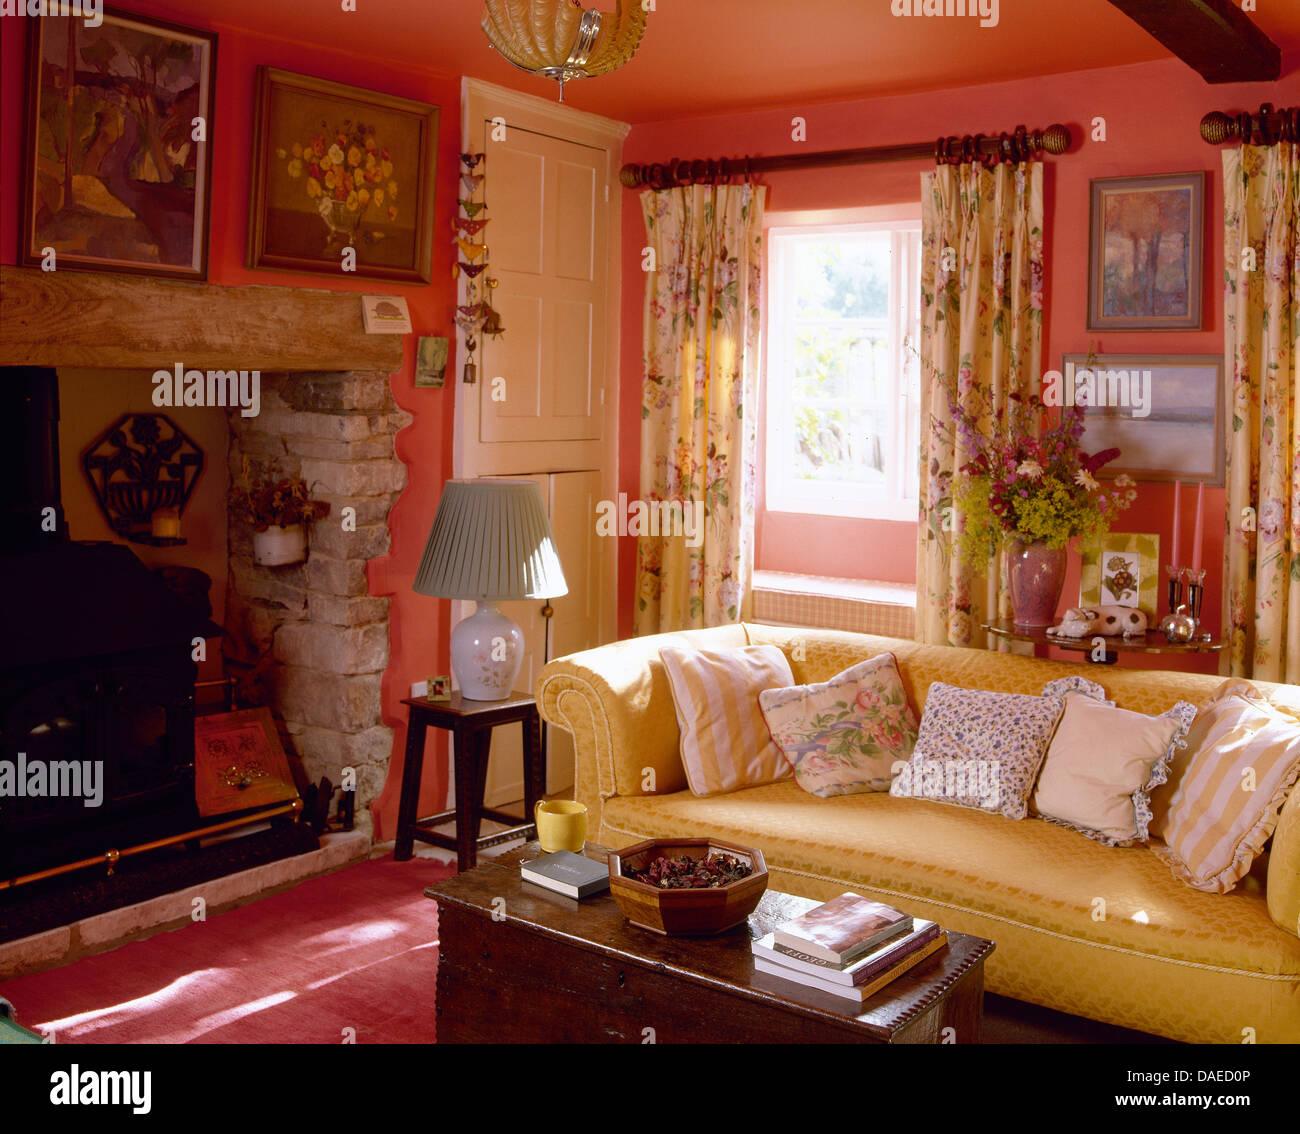 traditional furniture sofa inglenook stockfotos. Black Bedroom Furniture Sets. Home Design Ideas